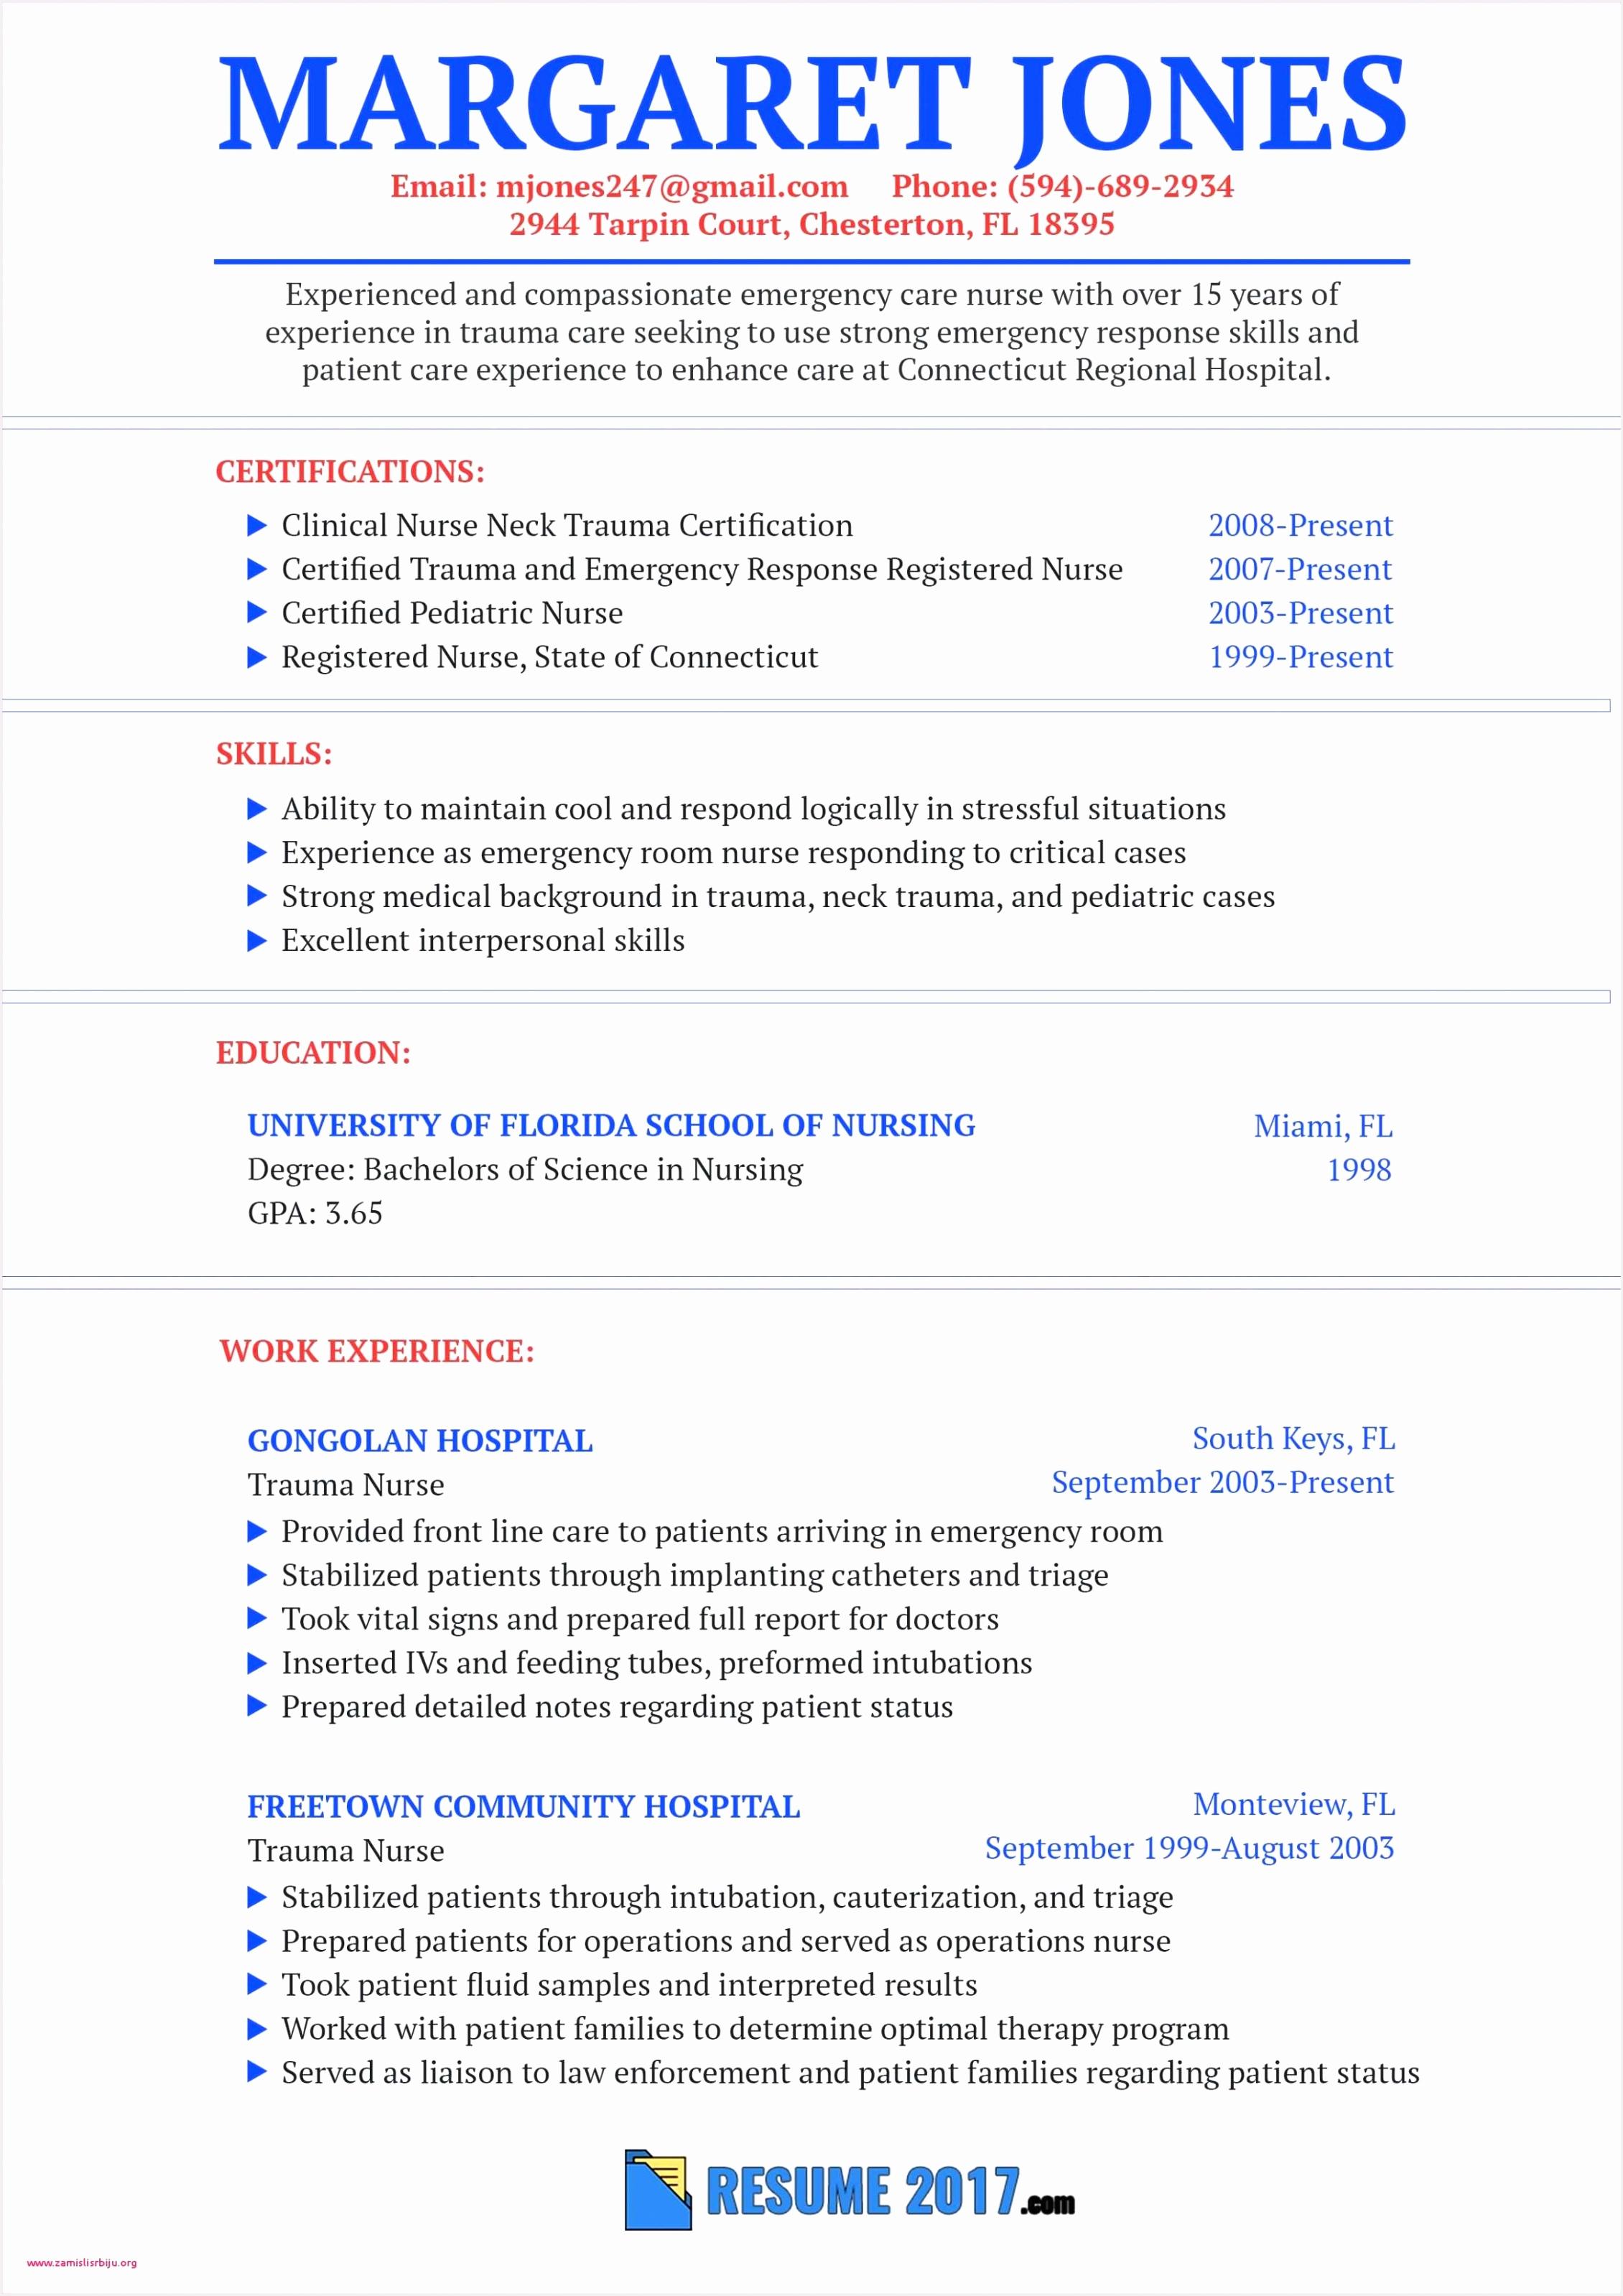 Sample Resumes Registered Nurses Free Nurse Resume Sample Fresh Rn Bsn Resume Awesome Nurse Resume 0d 31972260pjjtd